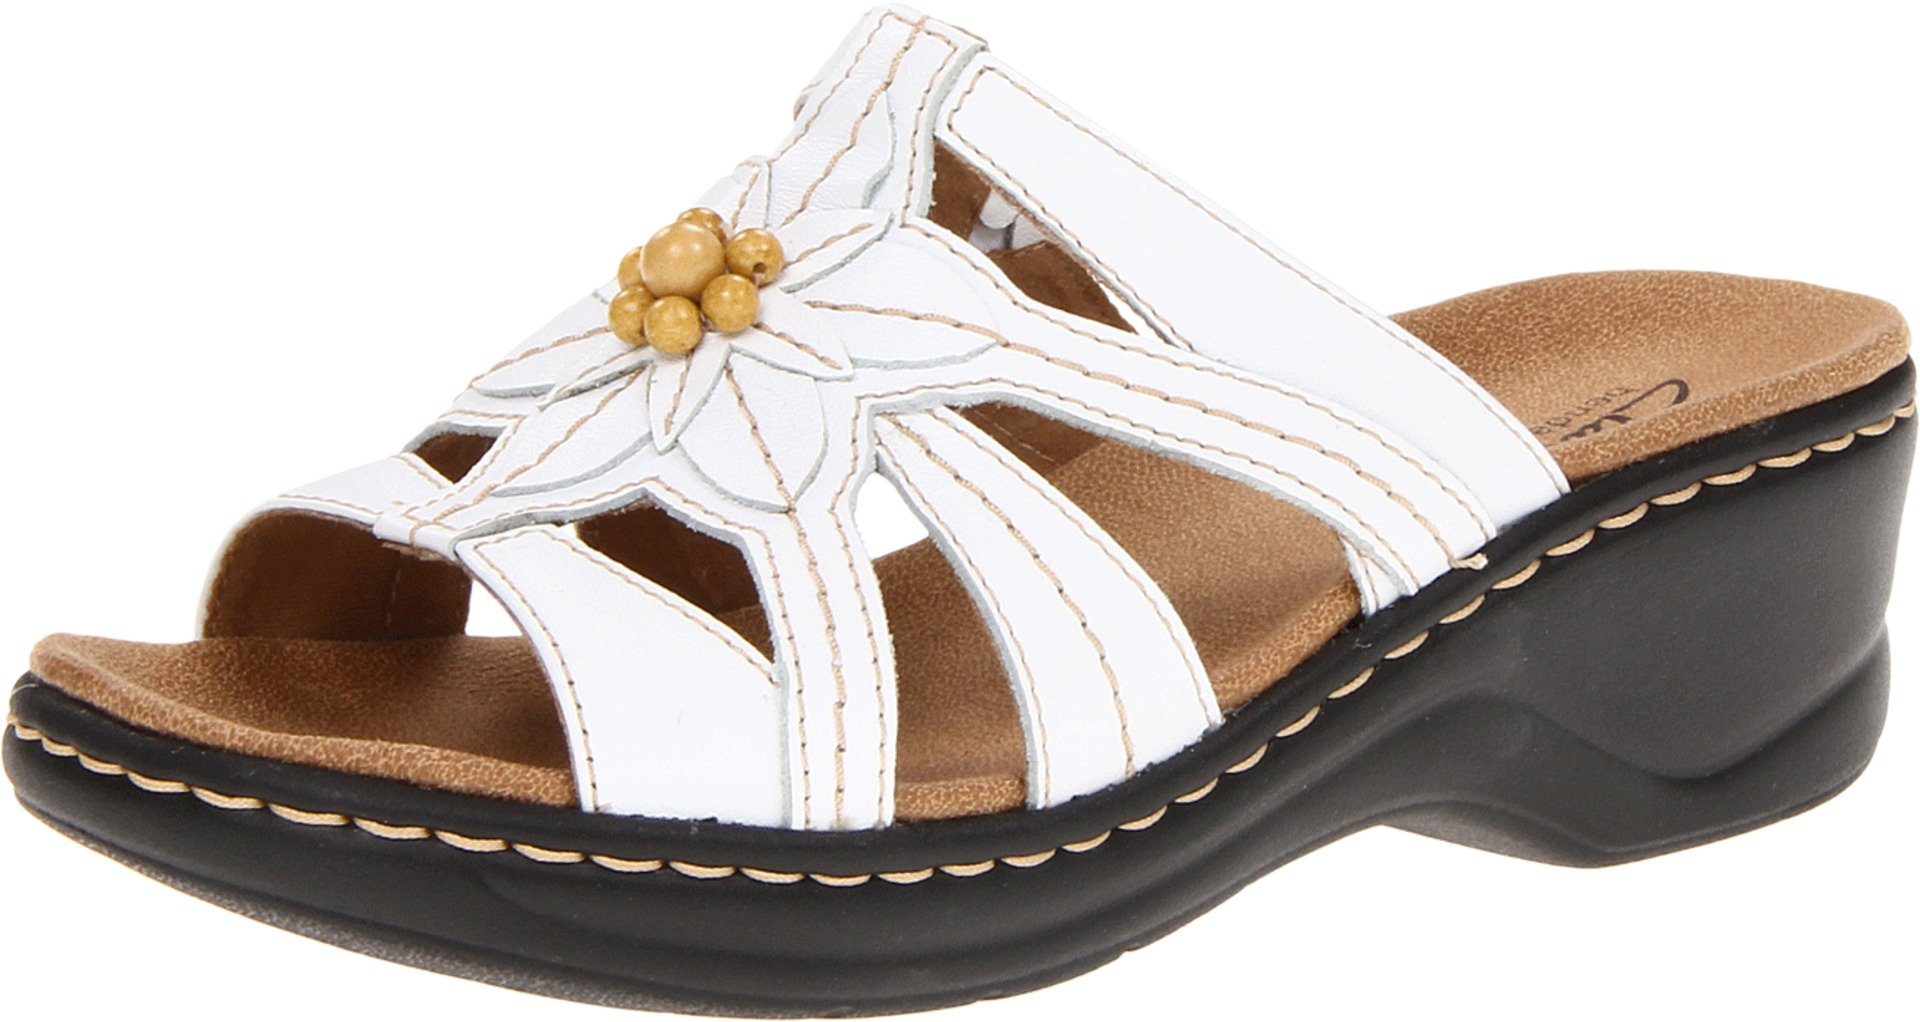 CLARKS Women's Lexi Myrtle Sandal,White,8 W US